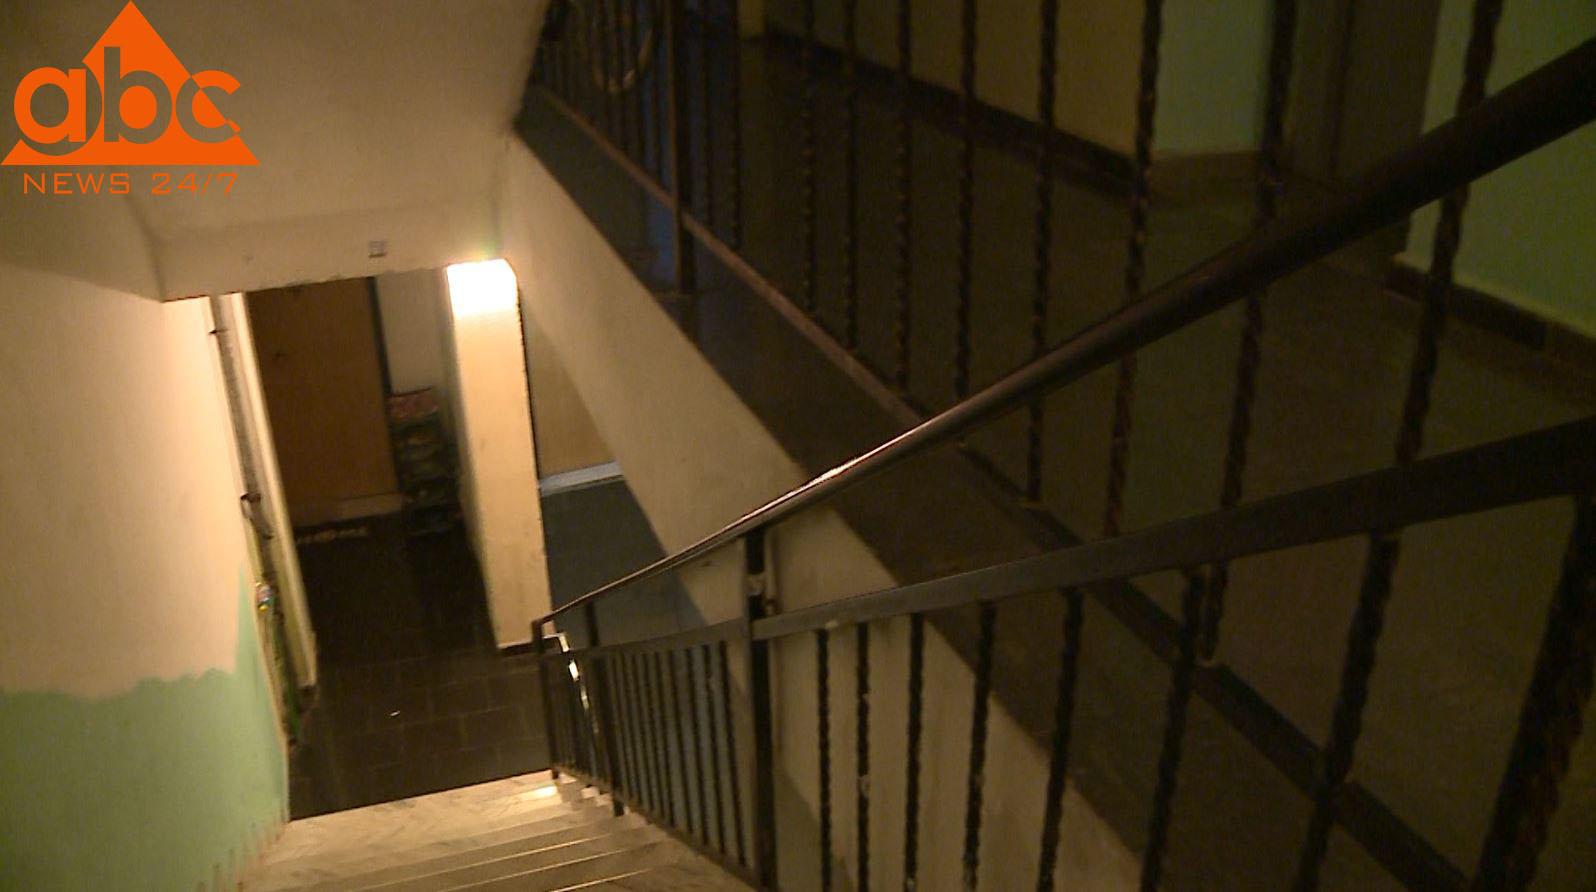 Çdo ditë 7 vjedhje banesash e biznesesh, policia apelon